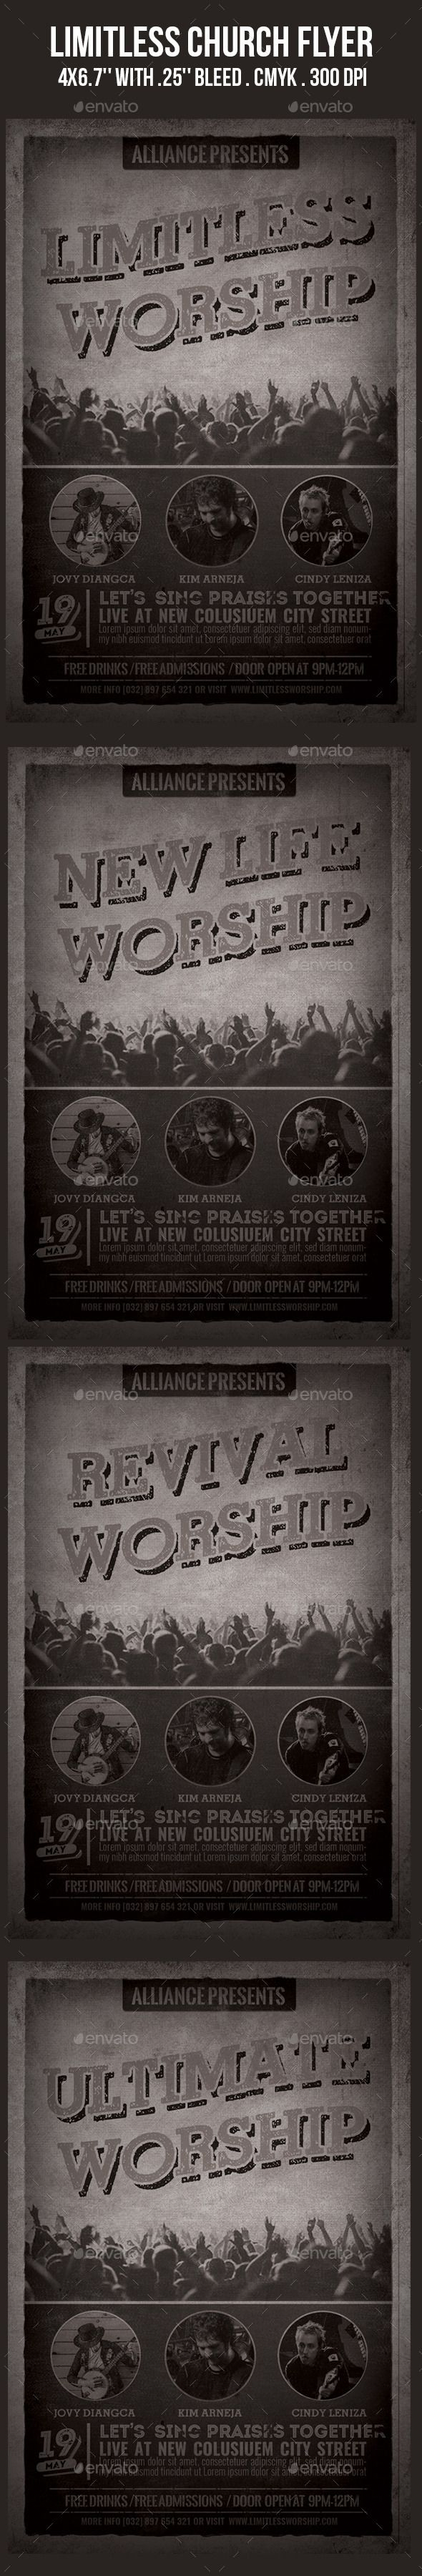 Limitless Church Flyer (CS2, 4x6, album release, alternative, band, Benefit, christian, church, concert, fest, festival, gig, gospel, grunge, indie, live, minimalist, music, party, pop, poster, praise, print, rock, show, singer, talent, vintage, worship, youth)